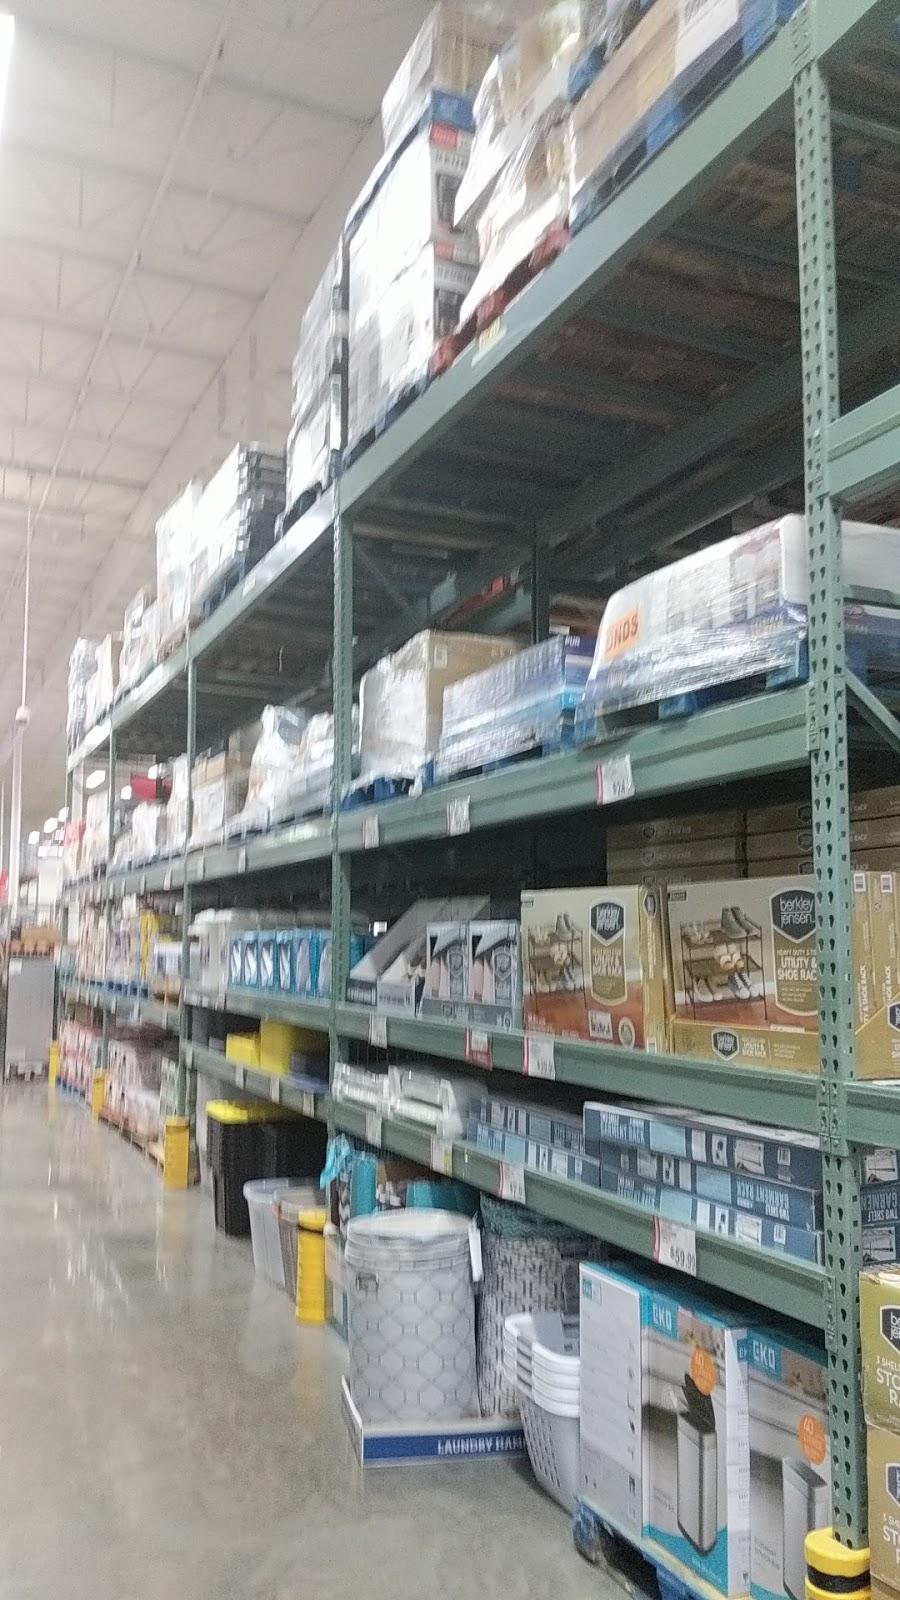 BJs Wholesale Club - gas station  | Photo 4 of 10 | Address: 8811 Brier Creek Pkwy, Raleigh, NC 27617, USA | Phone: (919) 806-5000